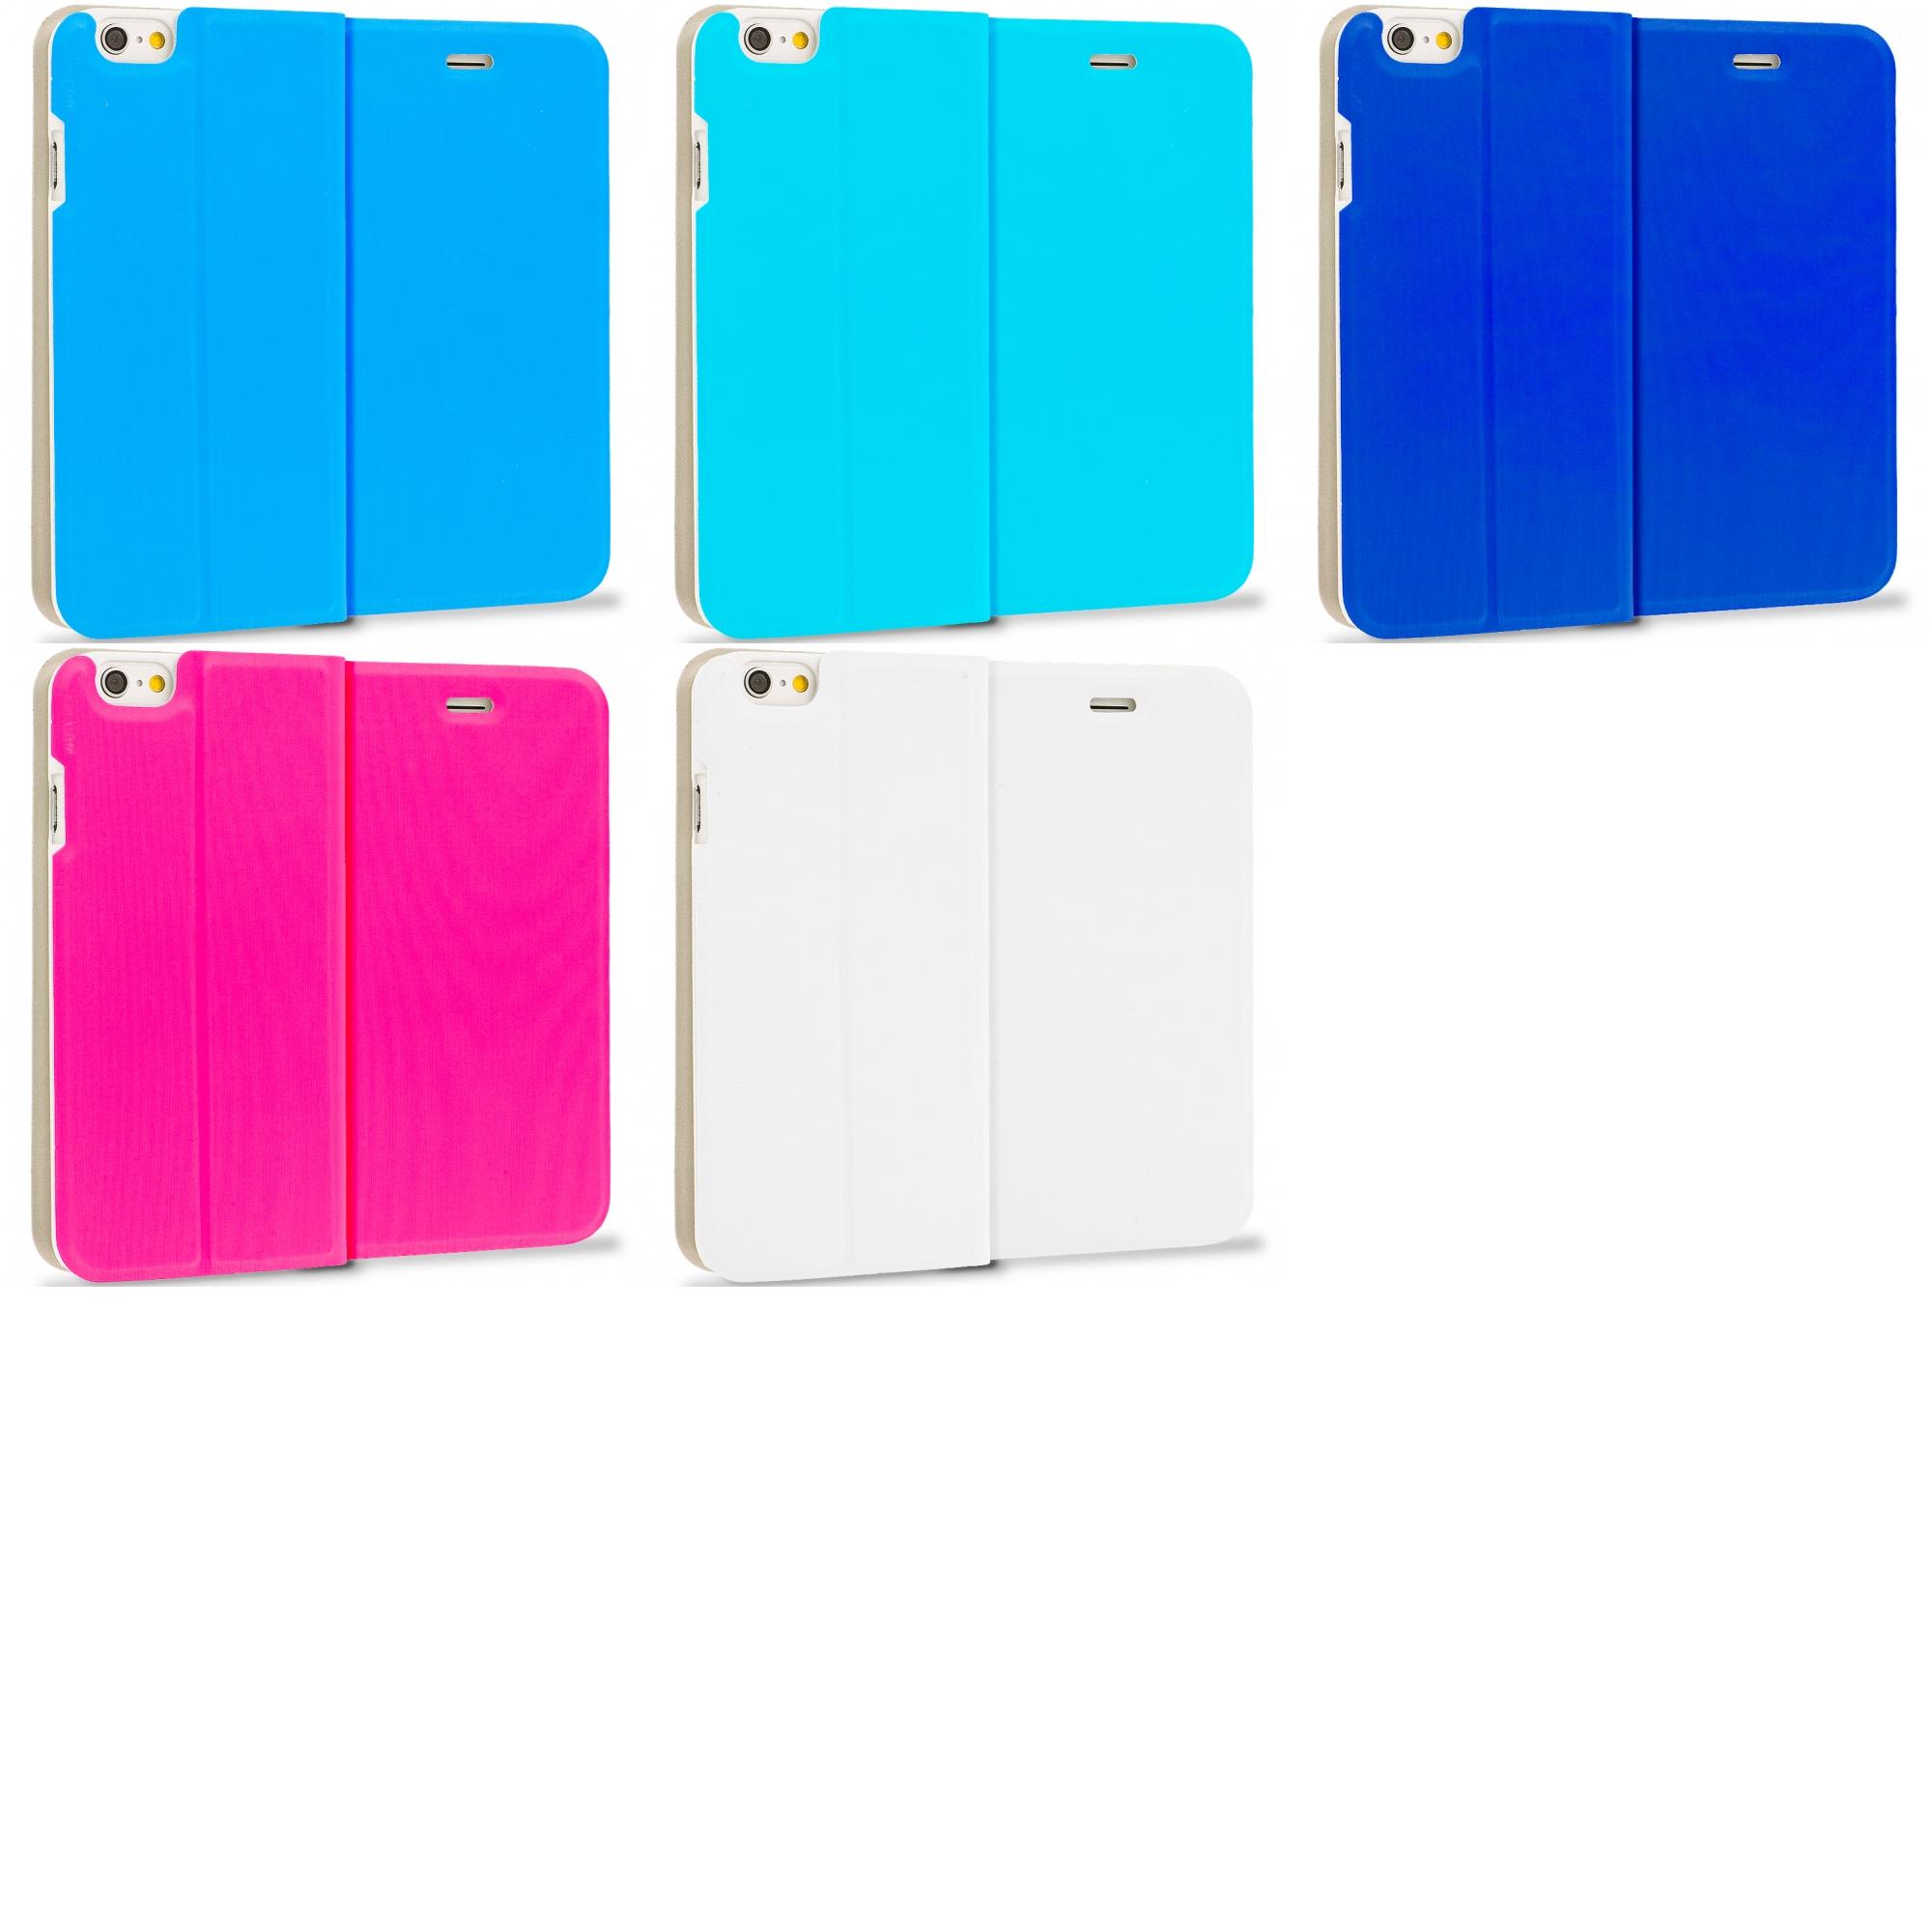 Apple iPhone 6 6S (4.7) 5 in 1 Combo Bundle Pack - Slim Flip Wallet Case Cover